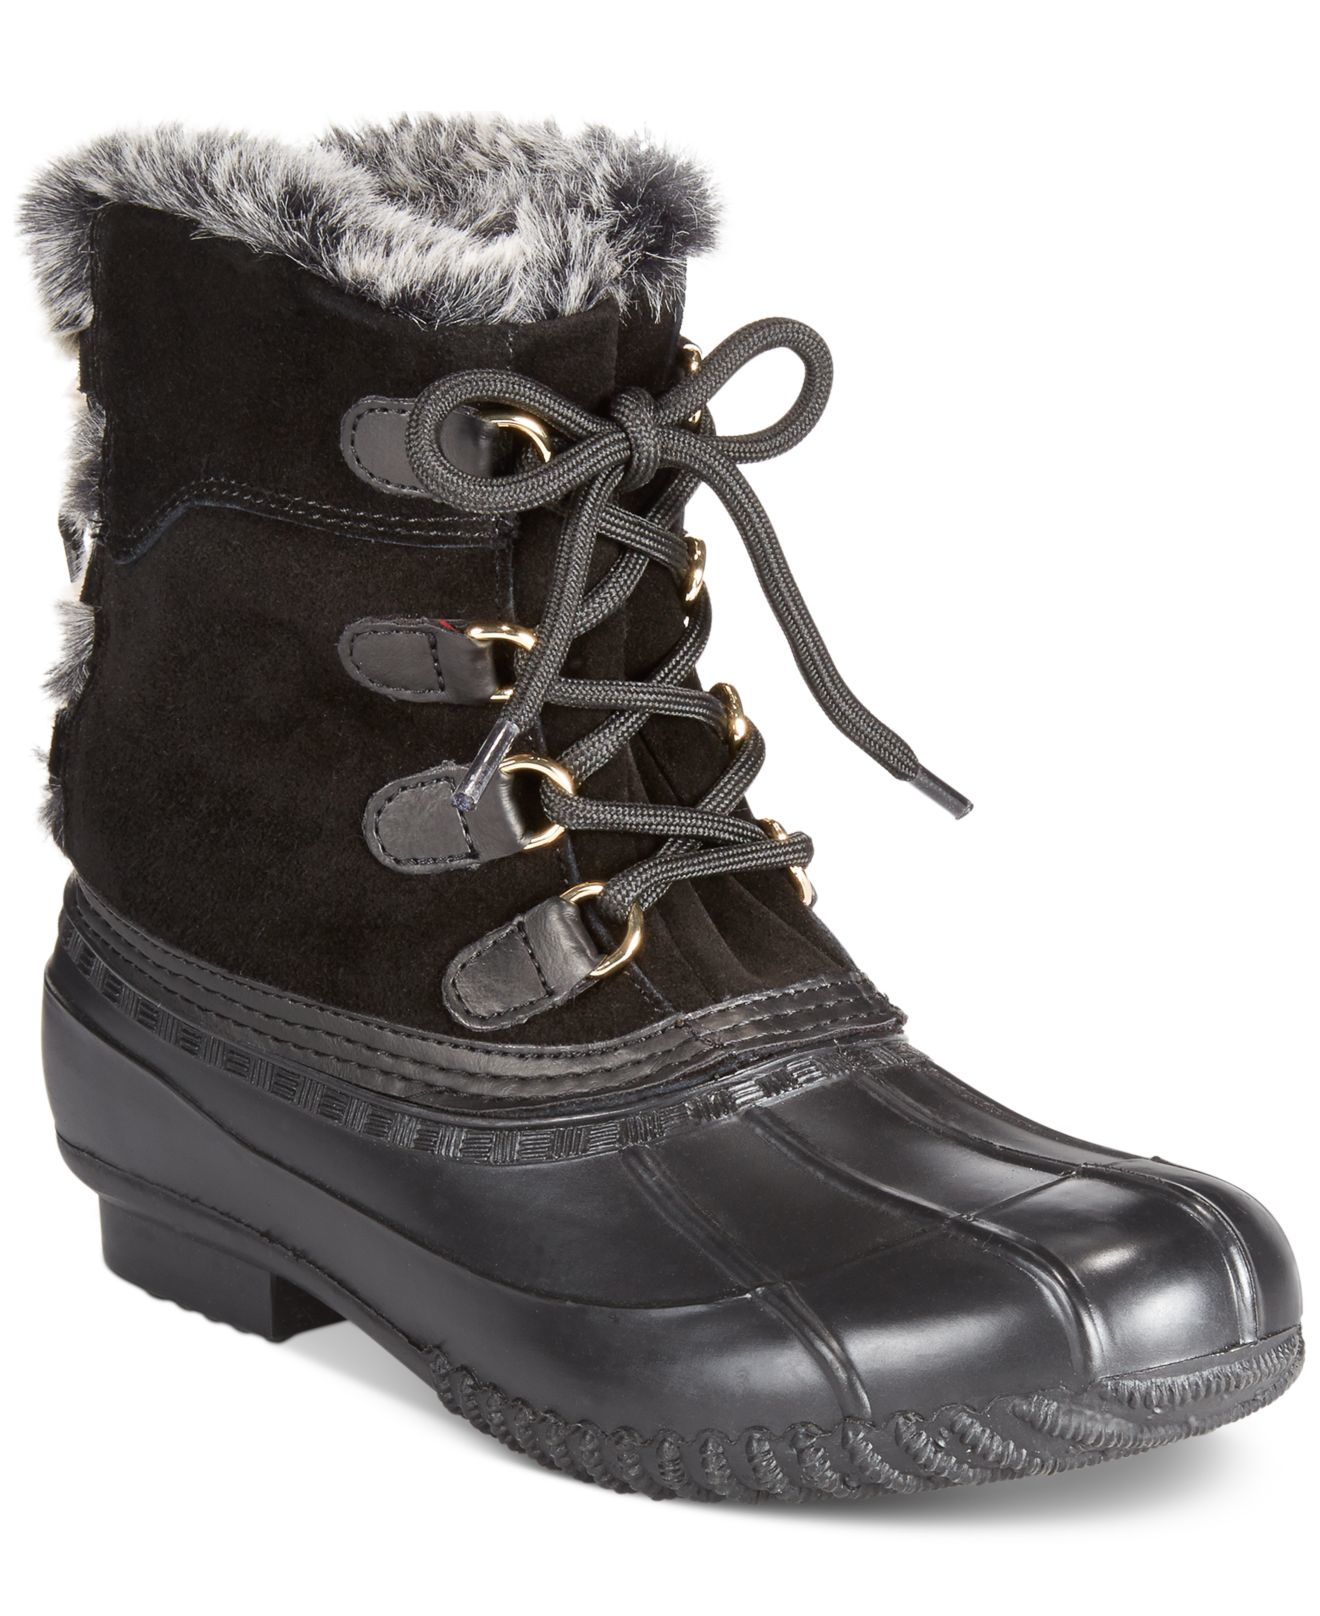 lyst tommy hilfiger rellenna cold weather boots in black. Black Bedroom Furniture Sets. Home Design Ideas